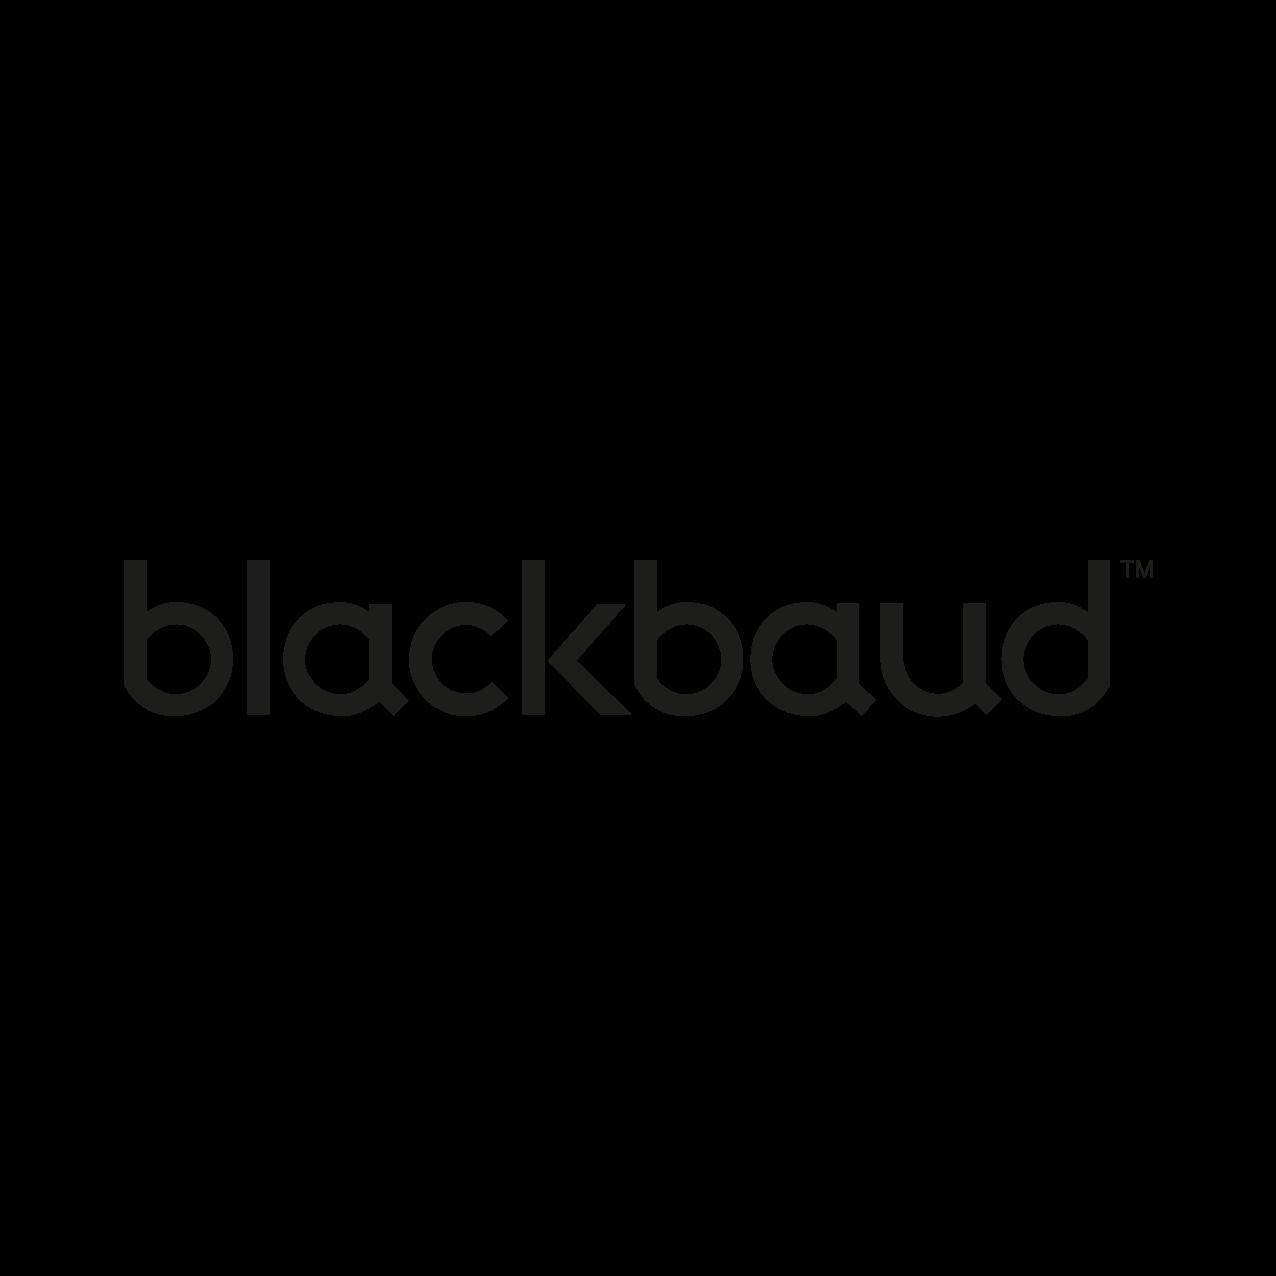 Blackbaud-logo.png